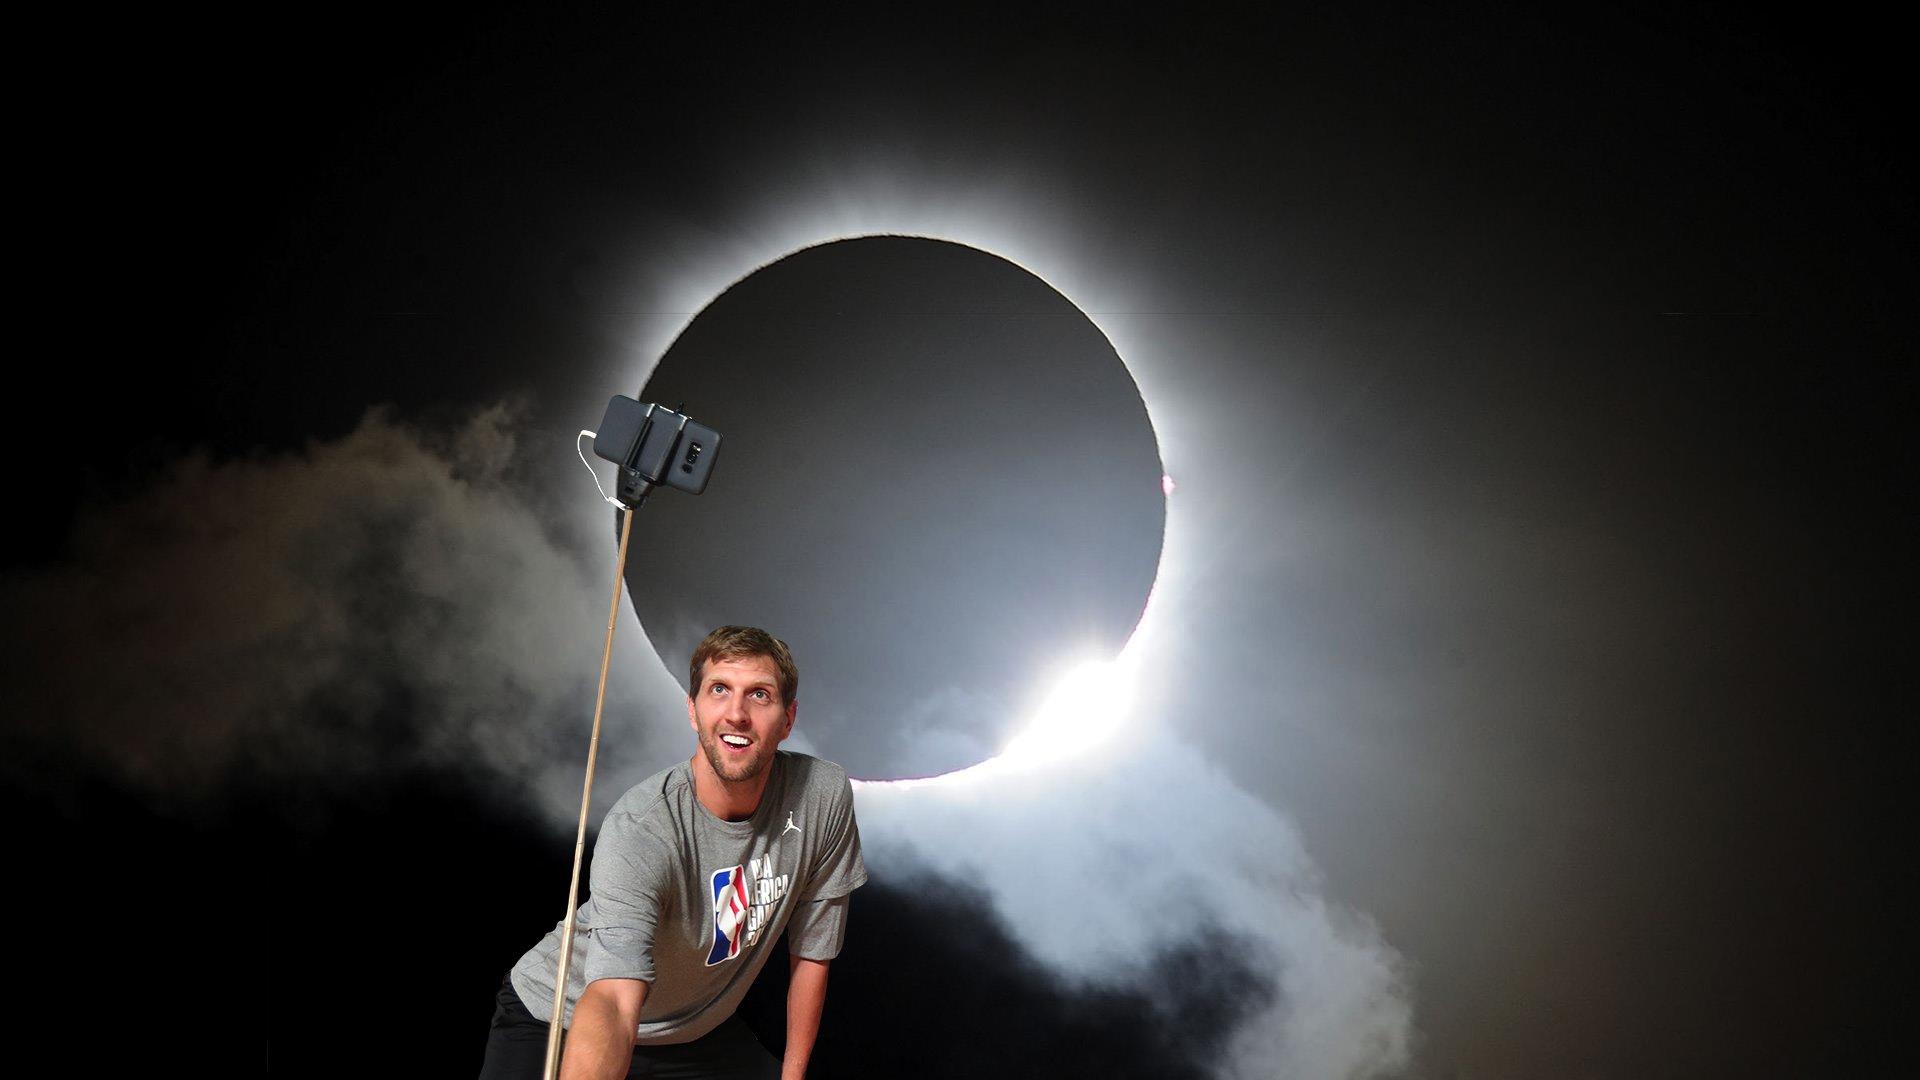 @its_just_chris @swish41 Here you go! #Selfie41 #eclipse17 https://t.co/Jfd9TvJSvu